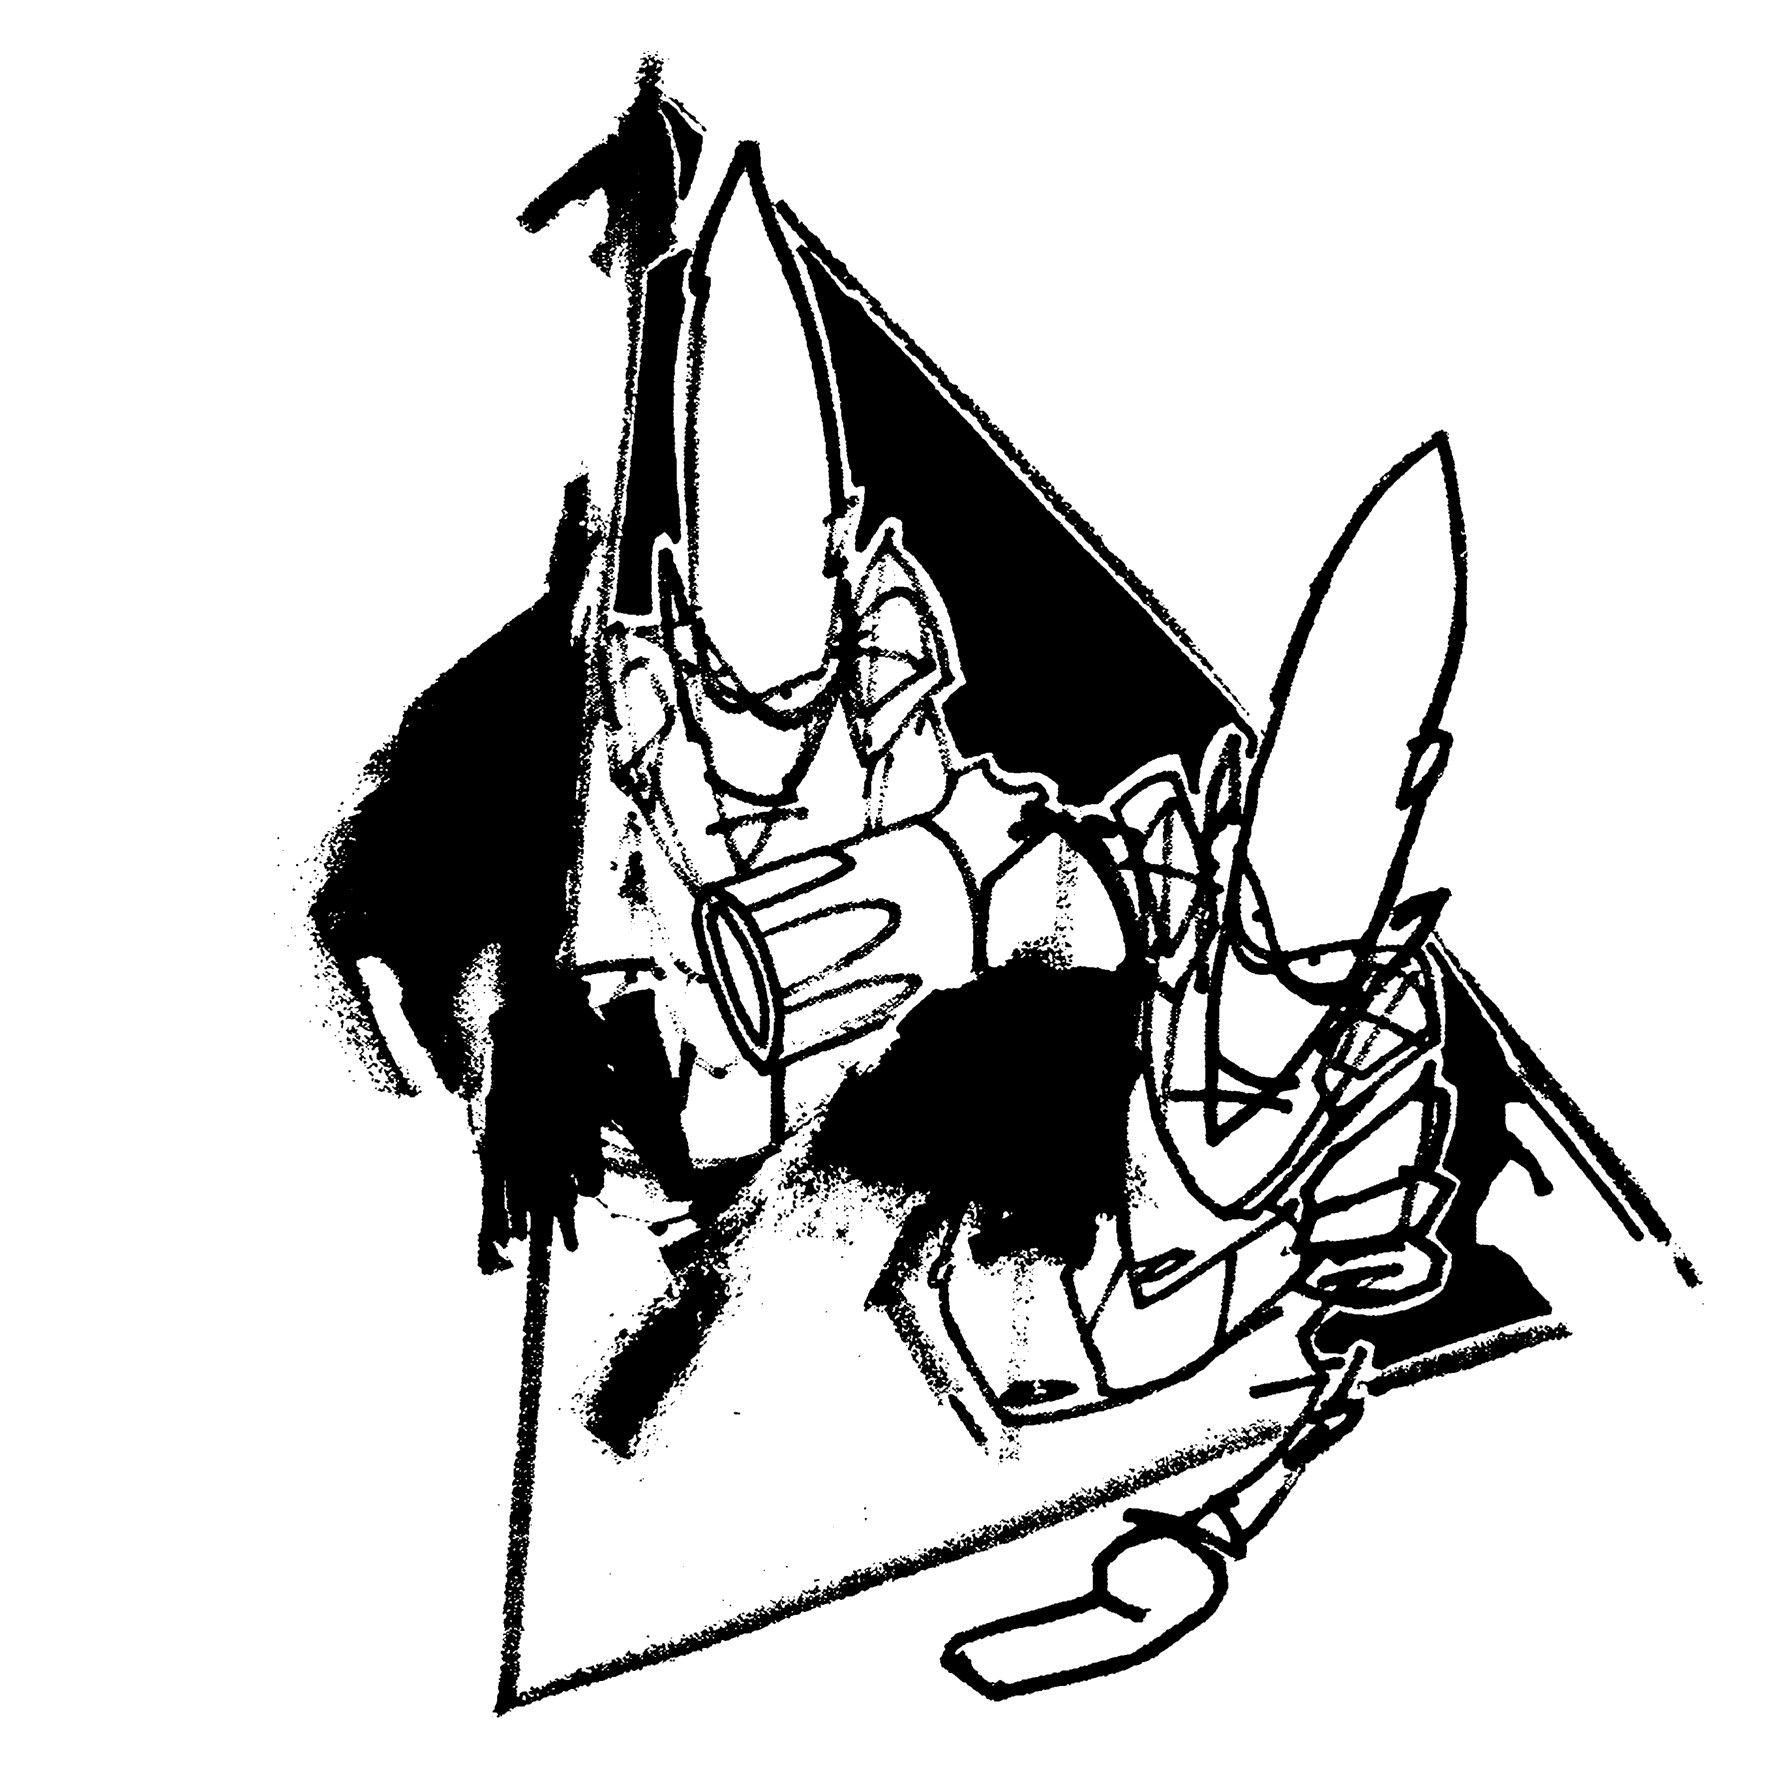 Unkle band logo